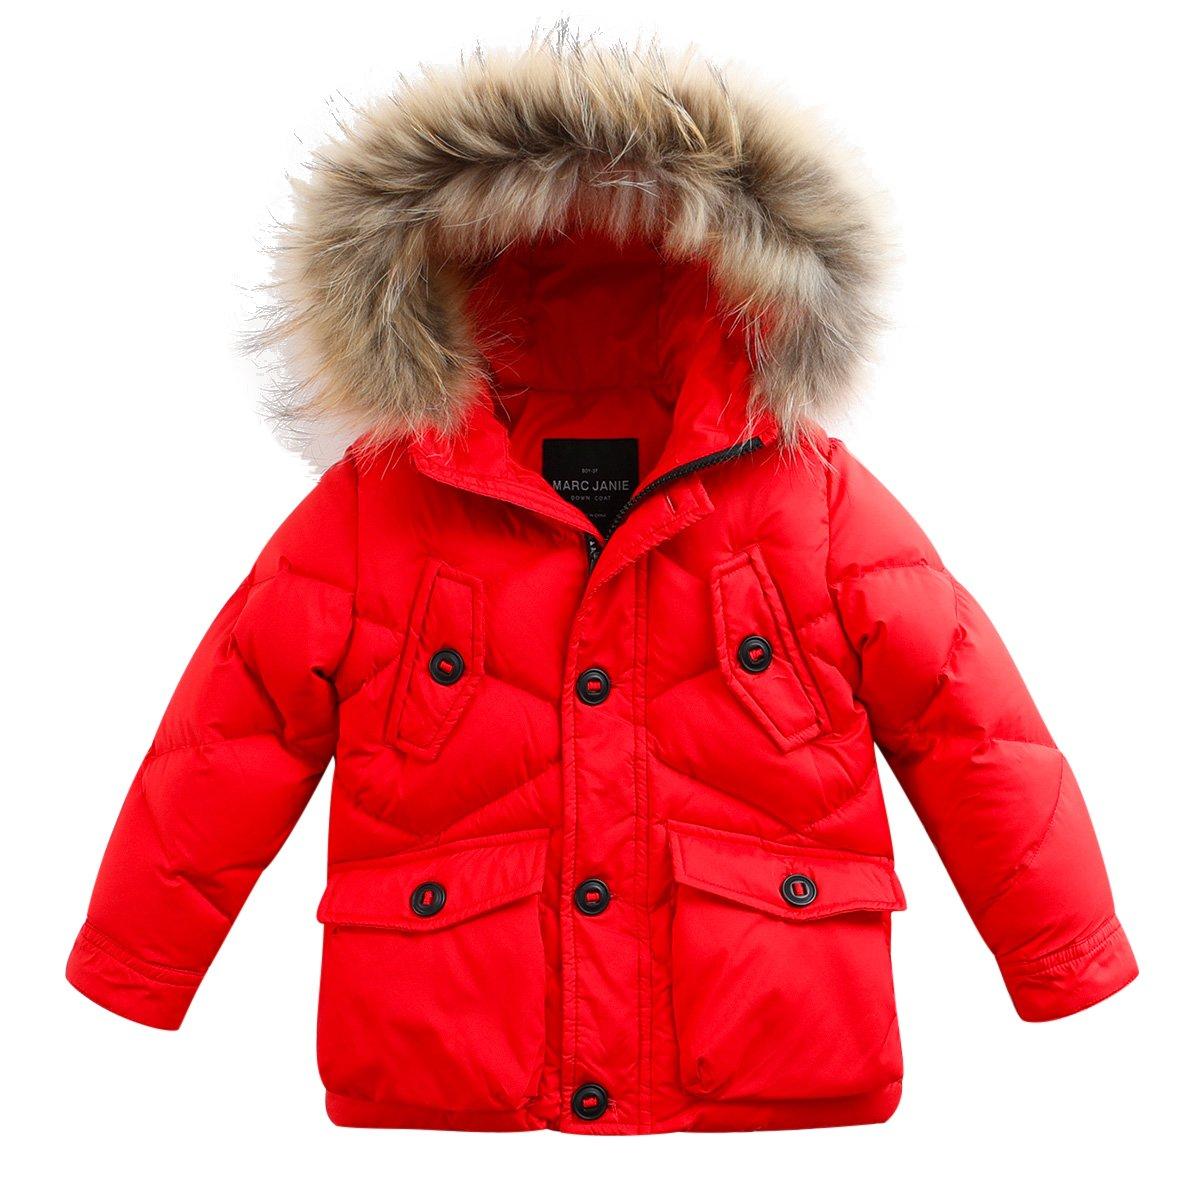 marc janie Baby Boys Kids' Lightweight Down Jacket With Raccoon Fur Collar Hood Puffer Winter Coat Reddish Orange 8T